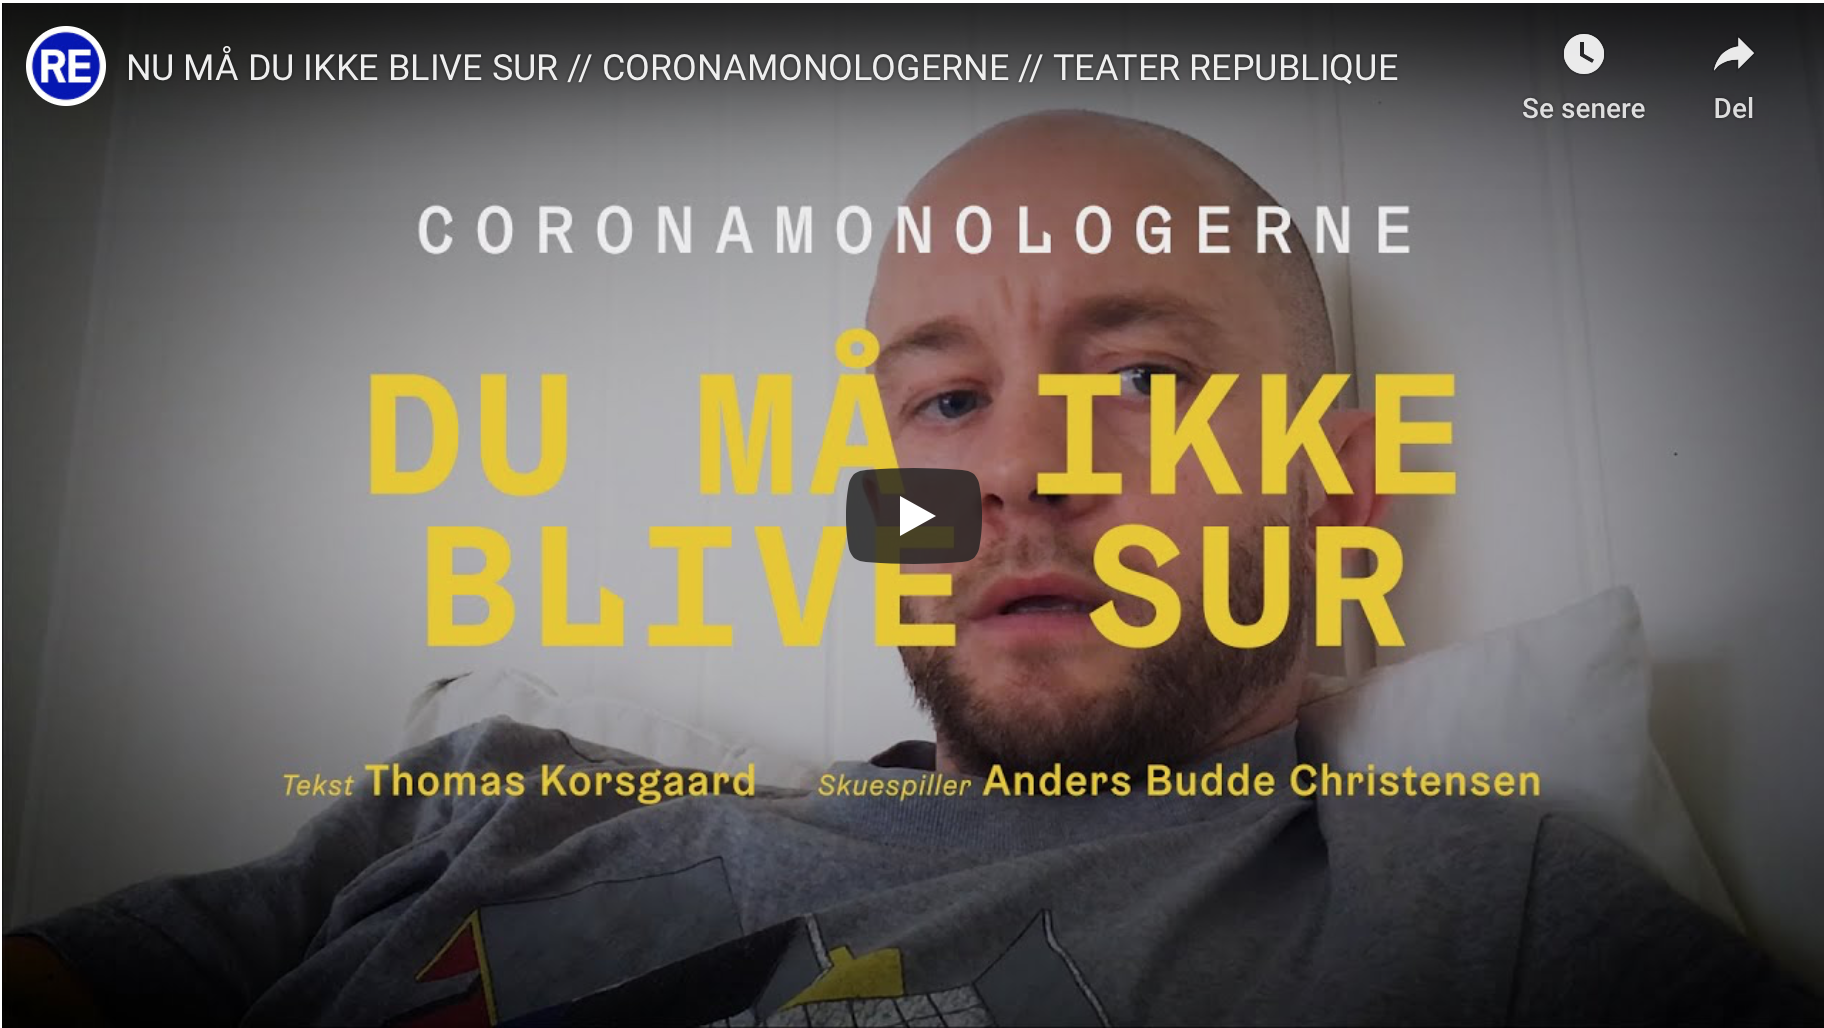 coronamonologerne teater république monolog anmeldelse information kulturmor